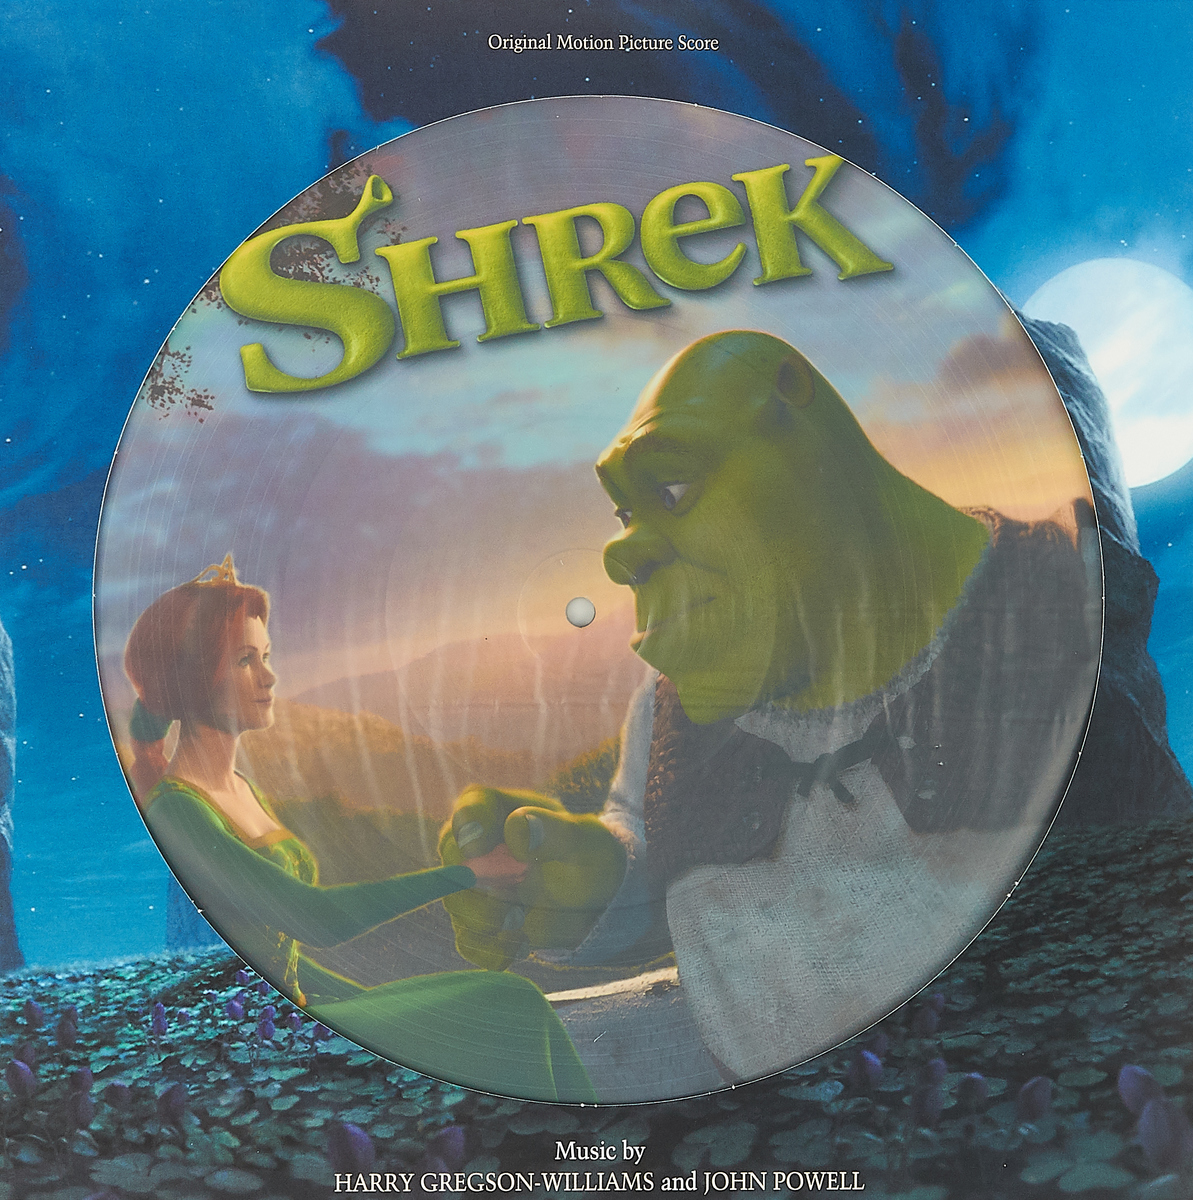 Shrek. Original Motion Picture Score (LP) the spy who loved me original motion picture score lp